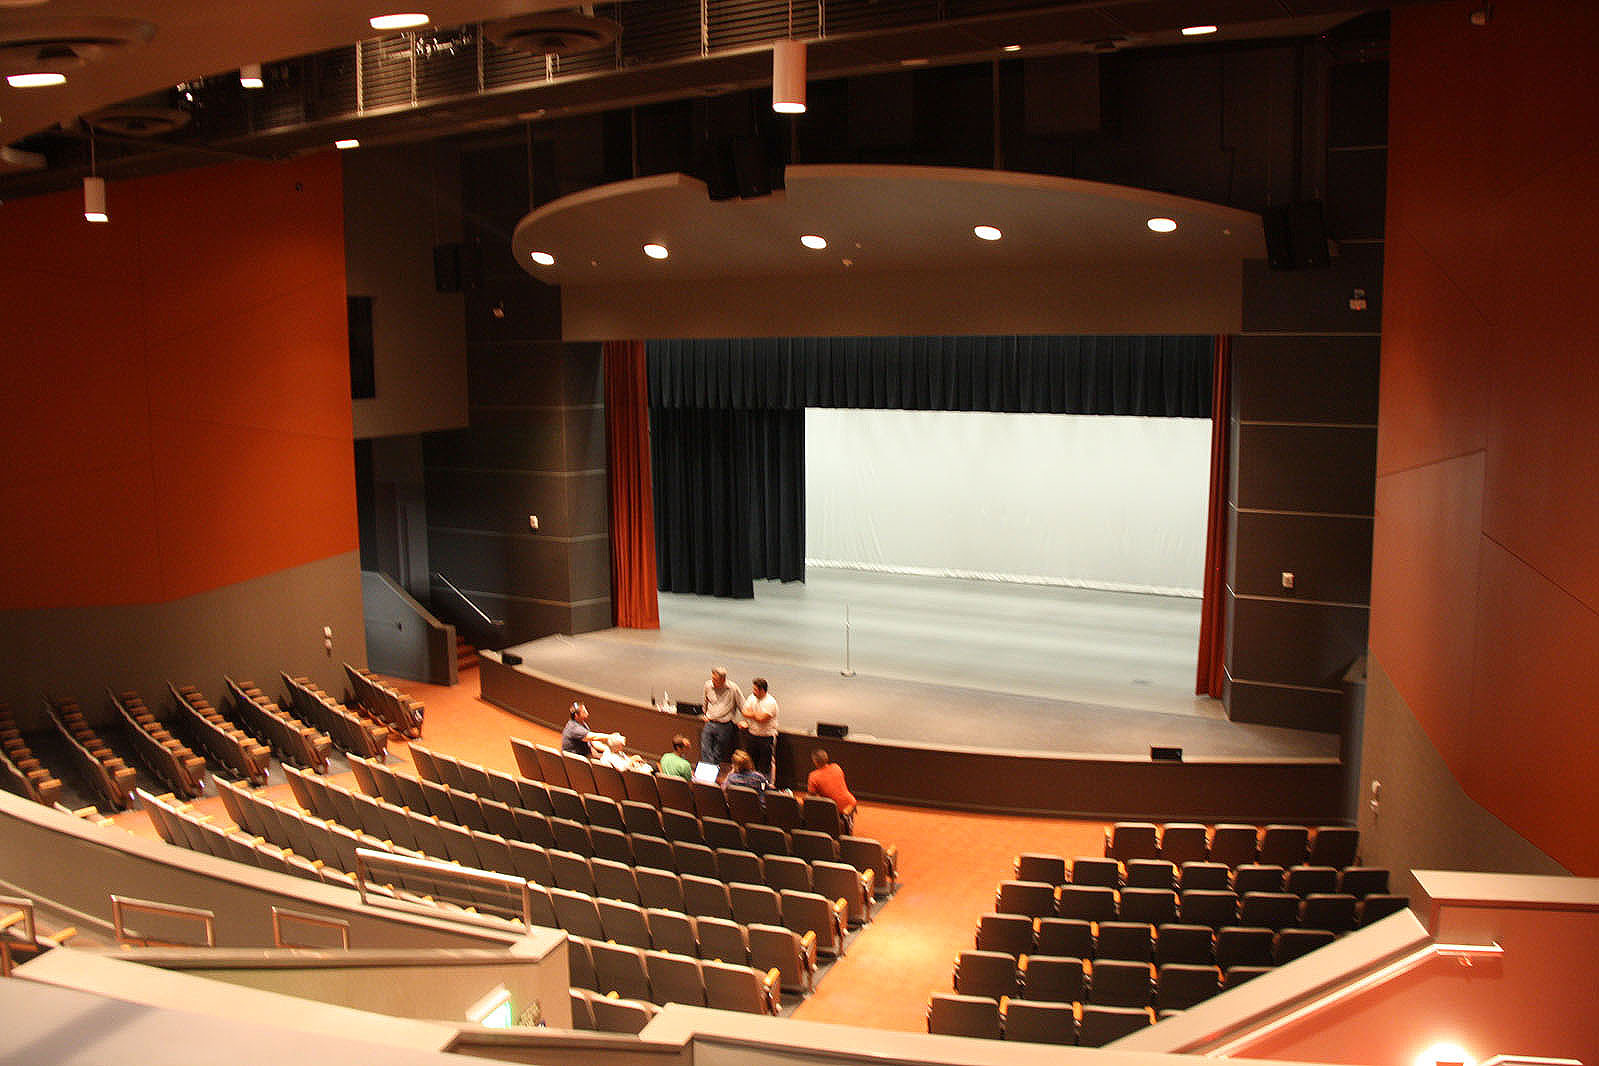 Helix Charter High School Performing Arts Complex